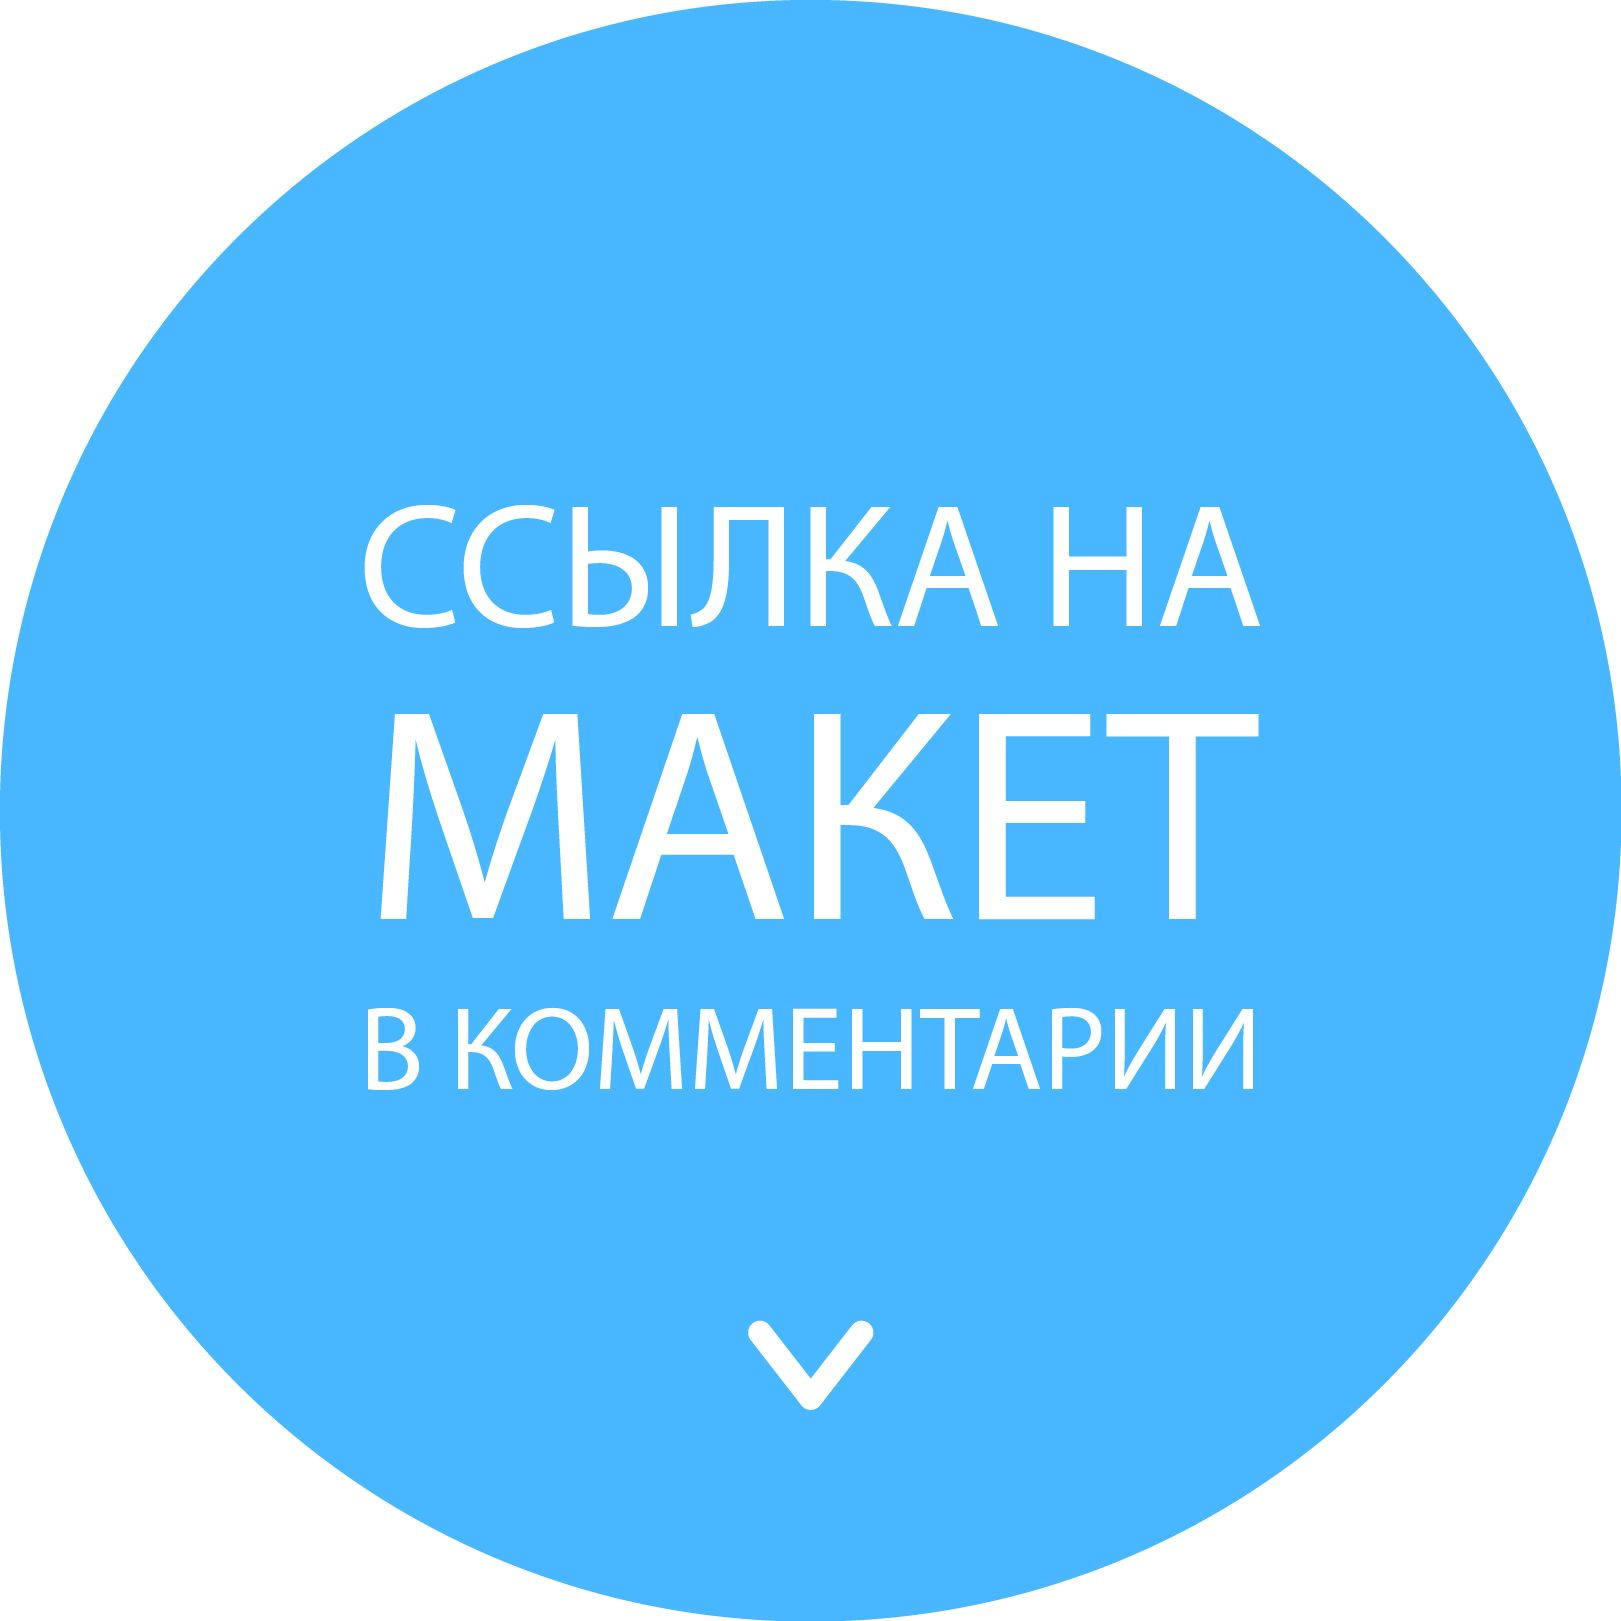 Новая главная страница agrotema.ru - дизайнер mrstepanov